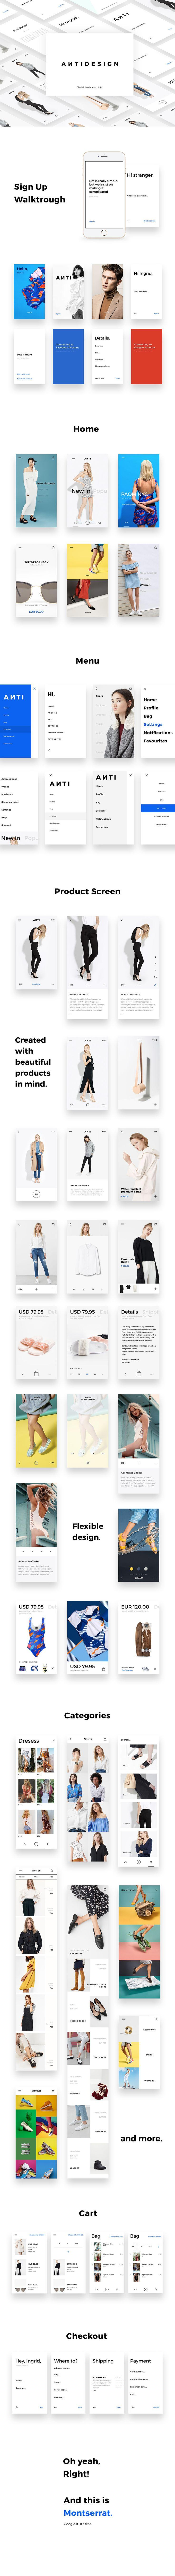 ANTIDESIGN - The Minimalist e-commerce UI Kit on Behance